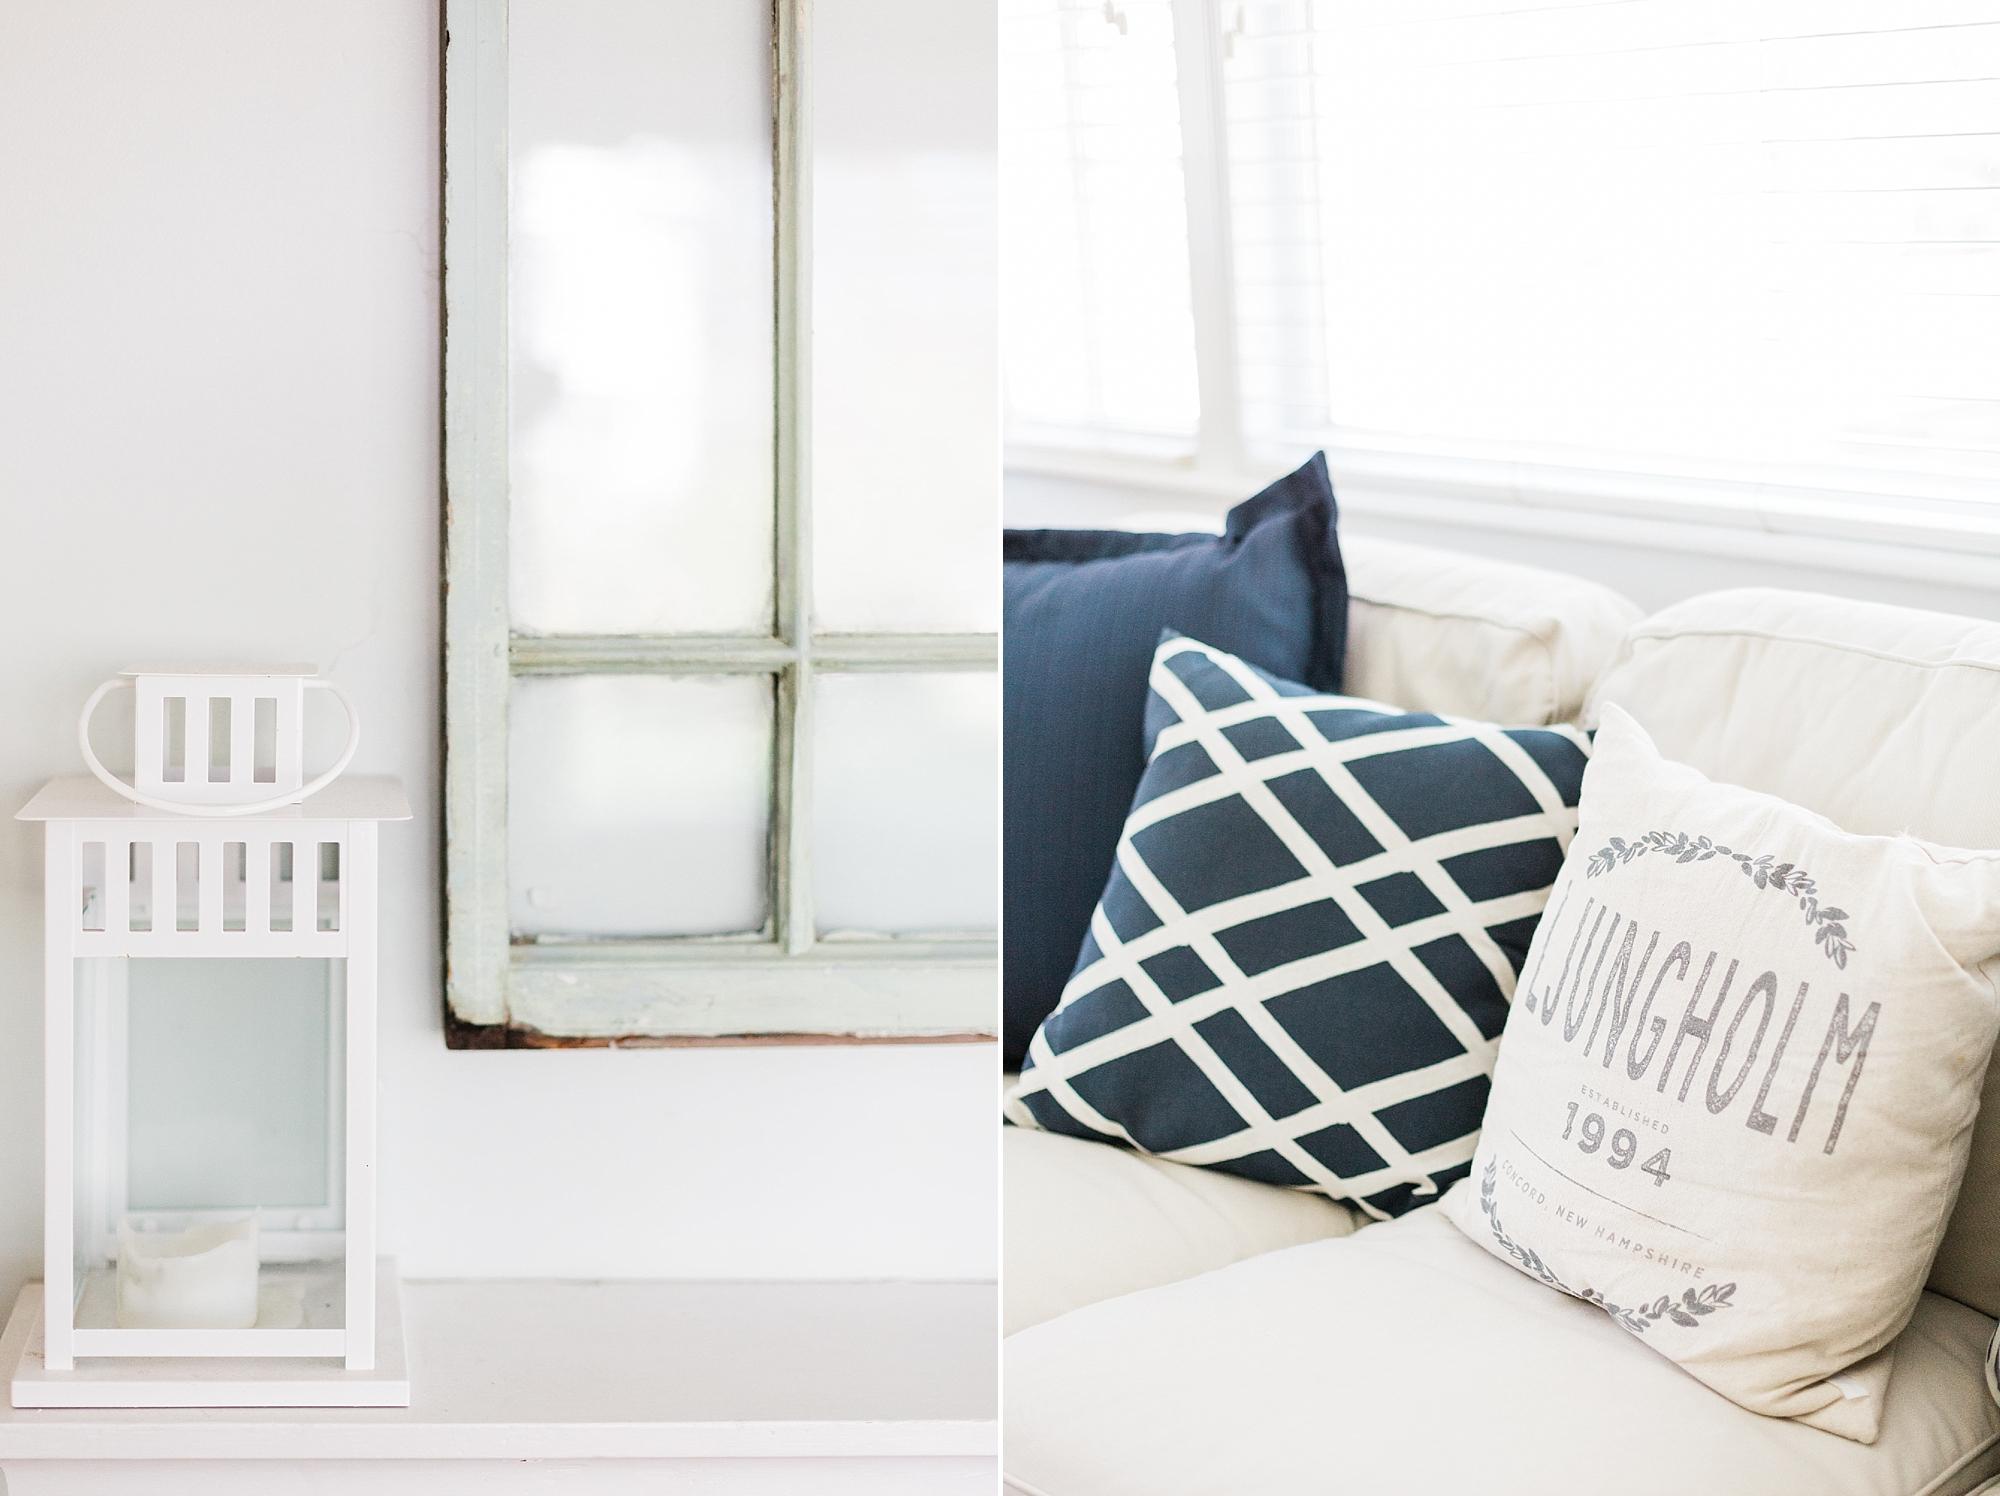 White Lantern - Navy Pillows - Living Room Decor - New Hampshire Home - Madison Rae Photography